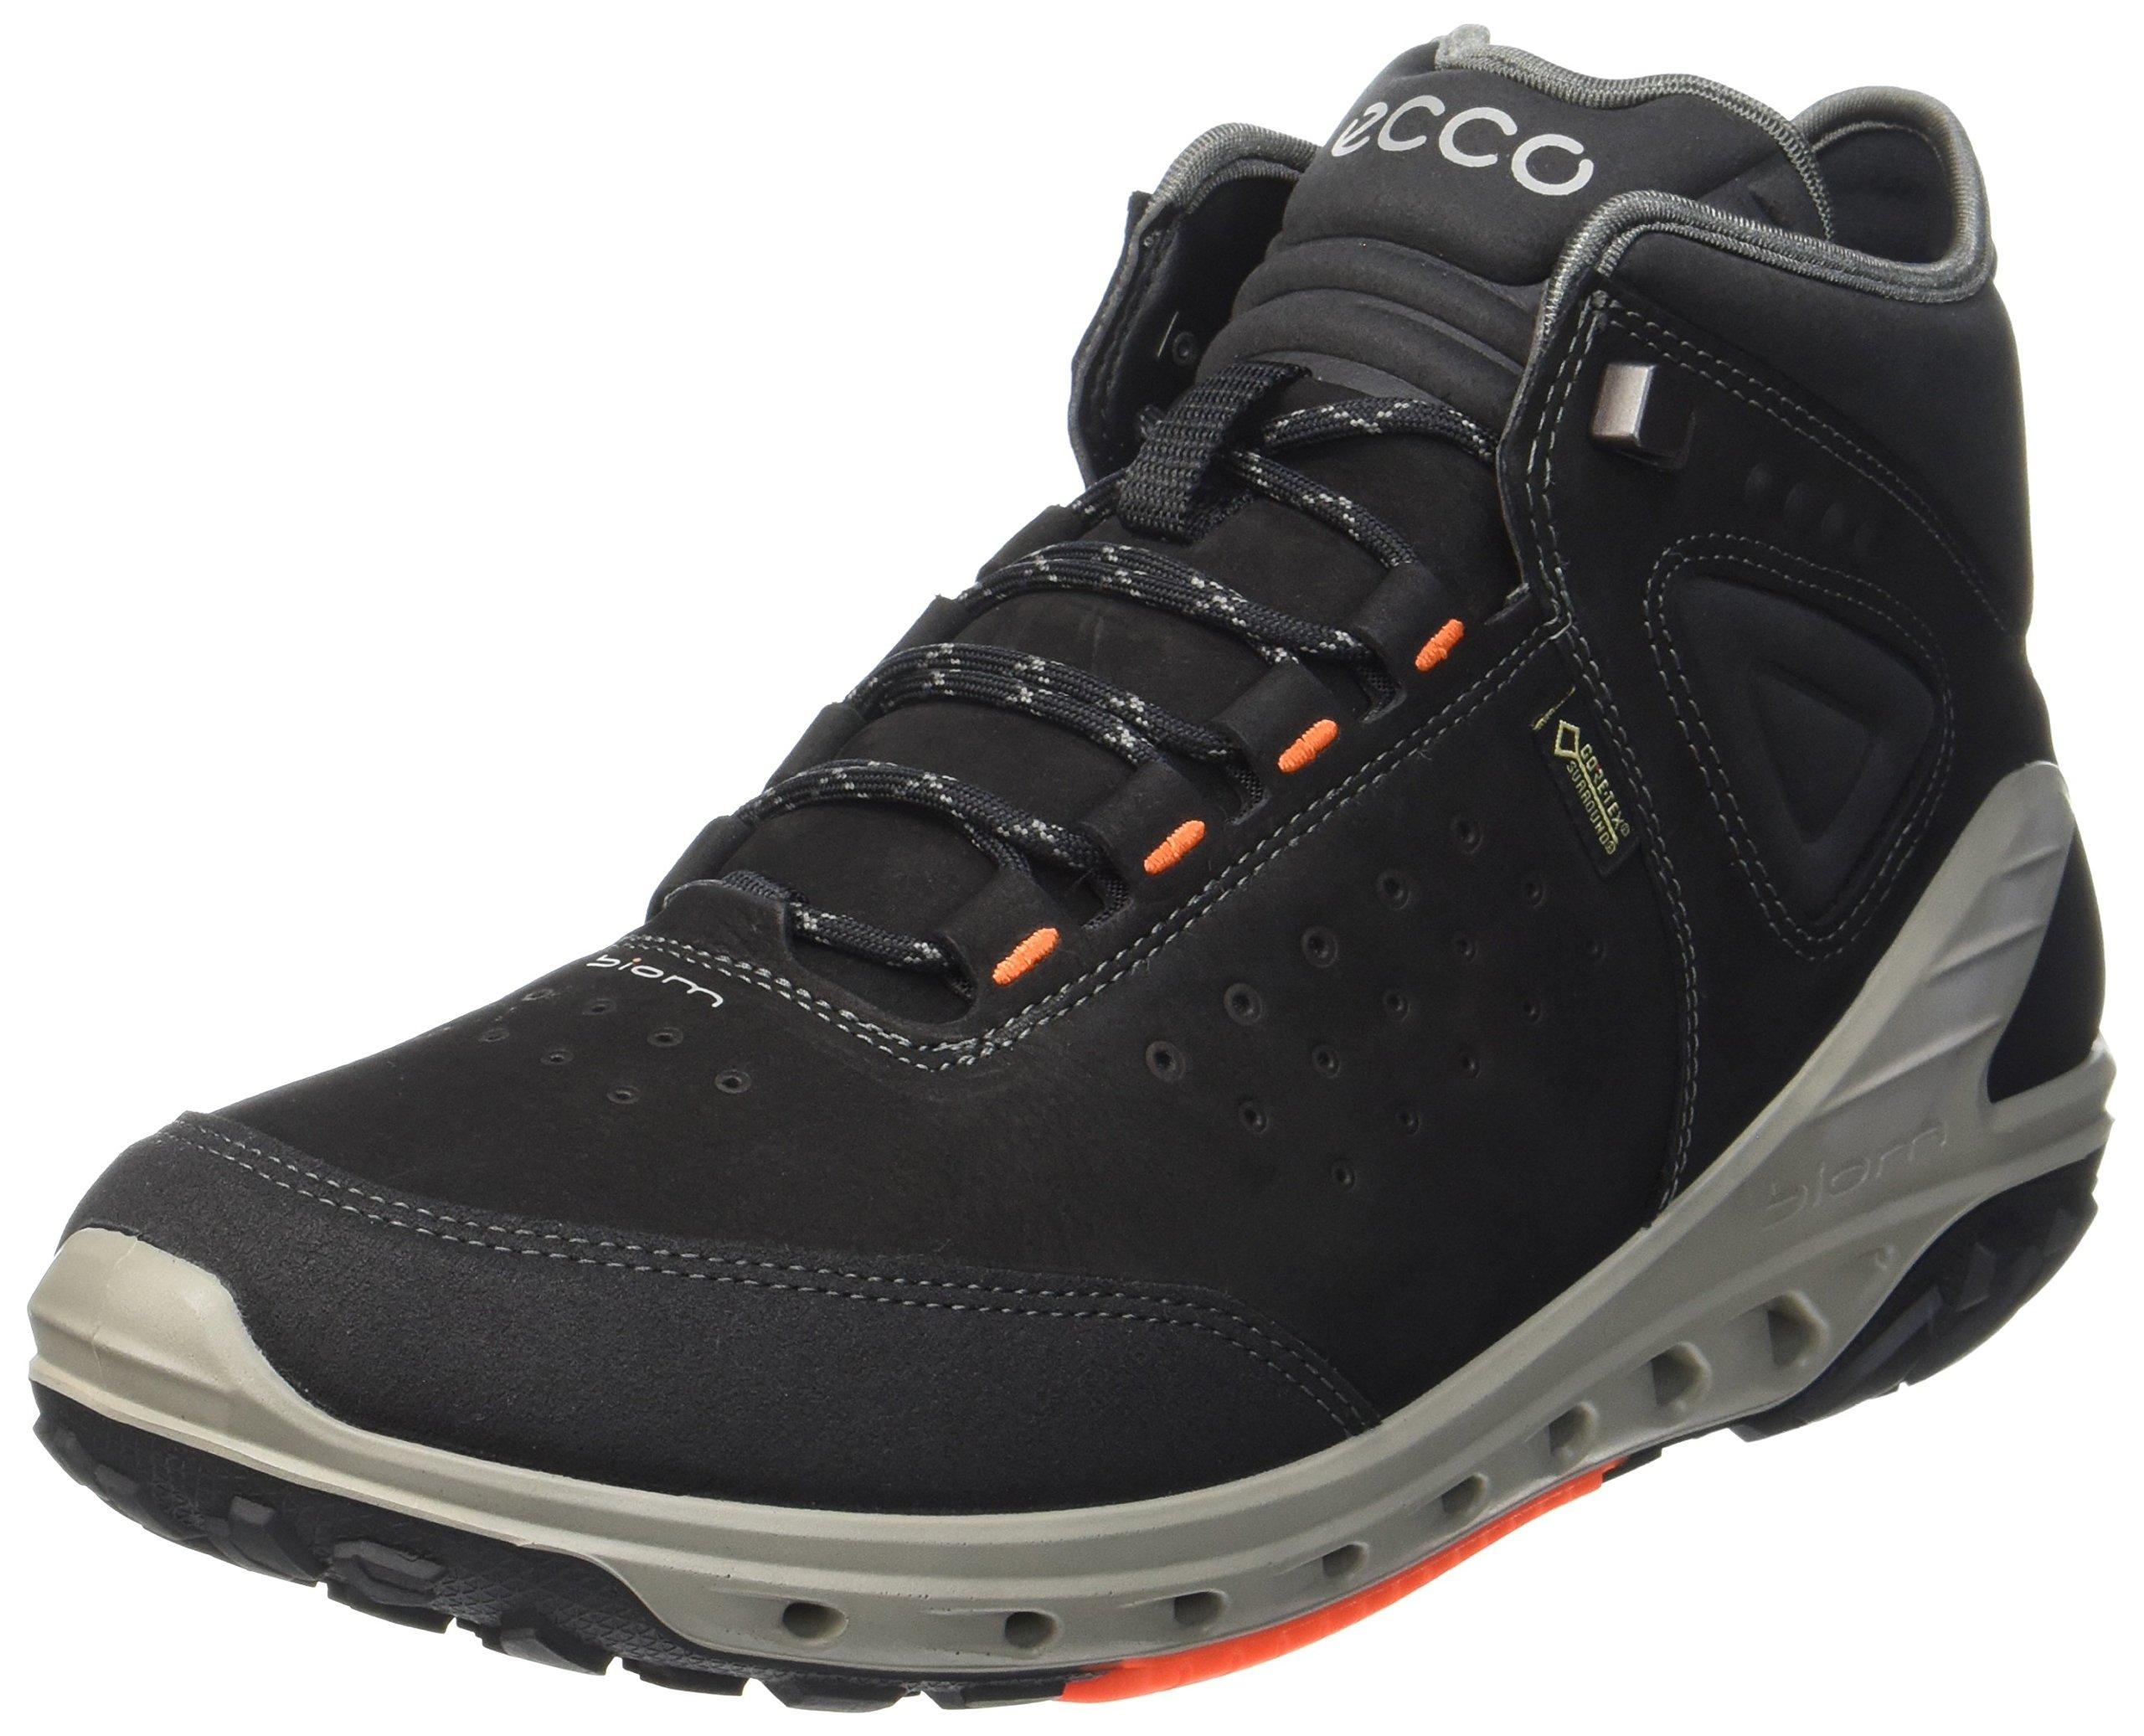 De Ecco Biom VentureChaussures Fitness Eu HommeNoir Black44 KTF13Jlc